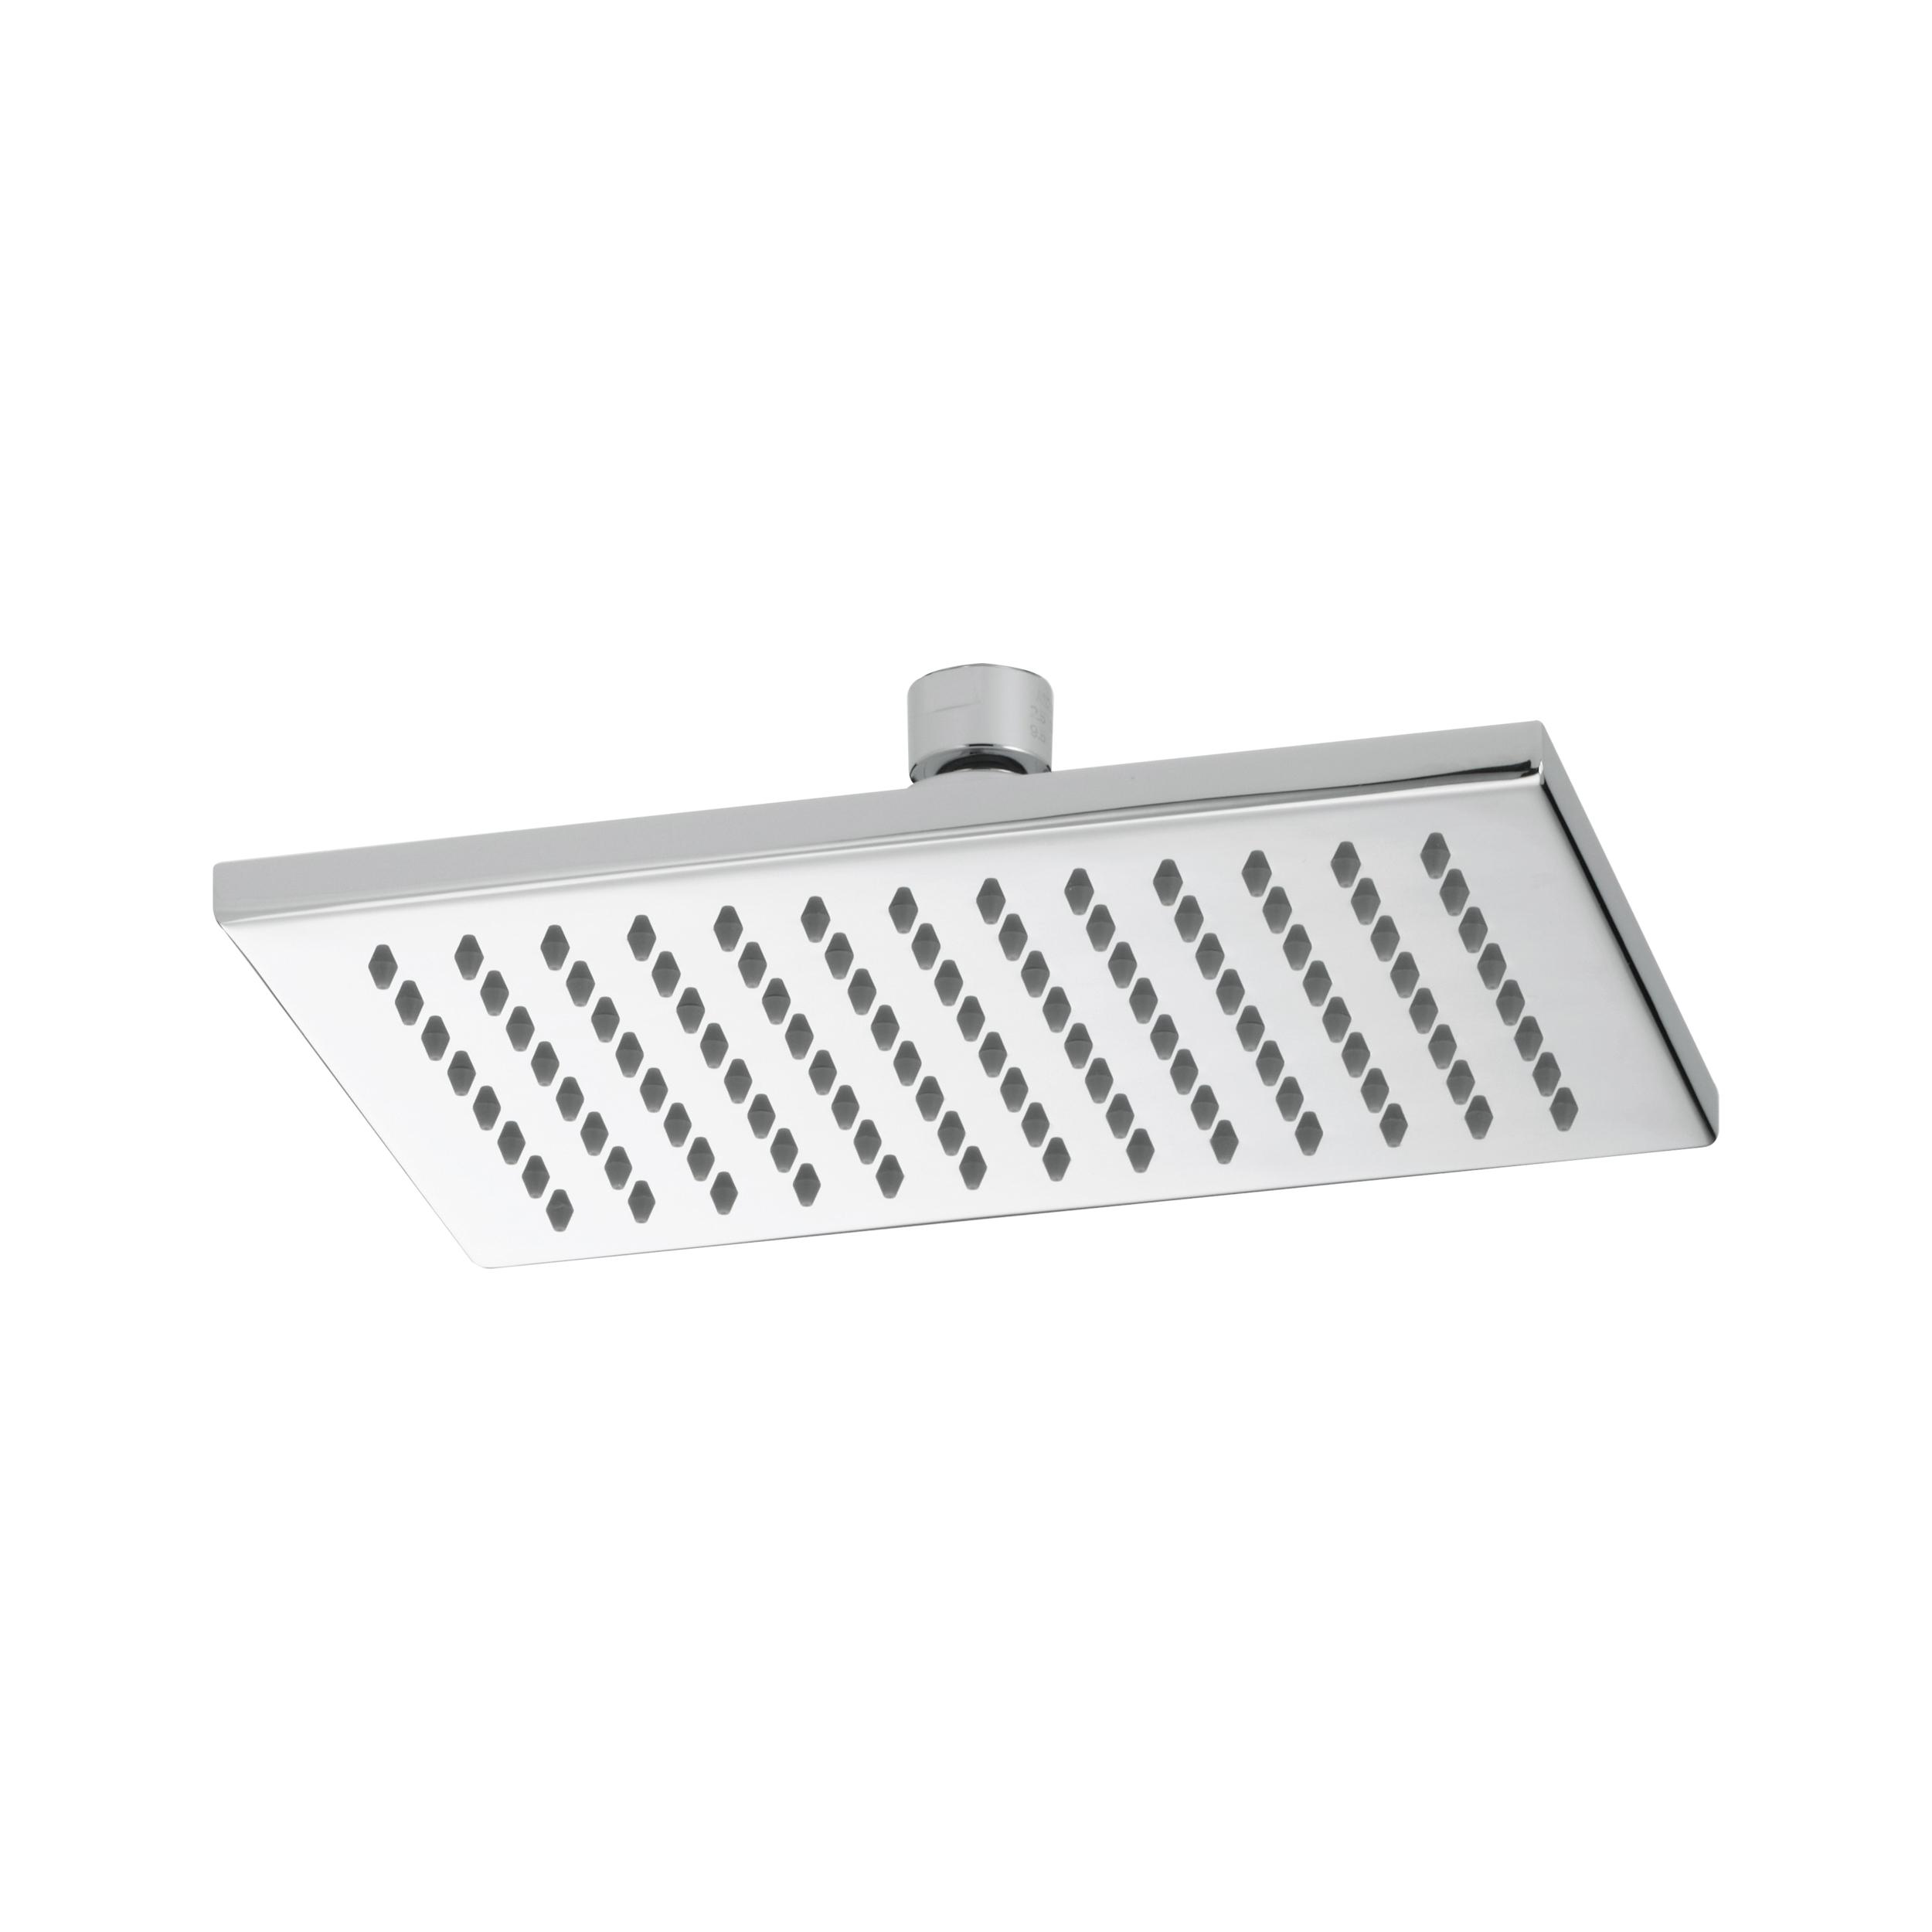 Brizo® 81380-PC-ECO Siderna® Raincan Shower Head, 2 gpm Maximum, 1 Spray, Ceiling/Wall Mount, 8-21/32 in L x 5-45/64 in W x 2-3/8 in H Head, Import